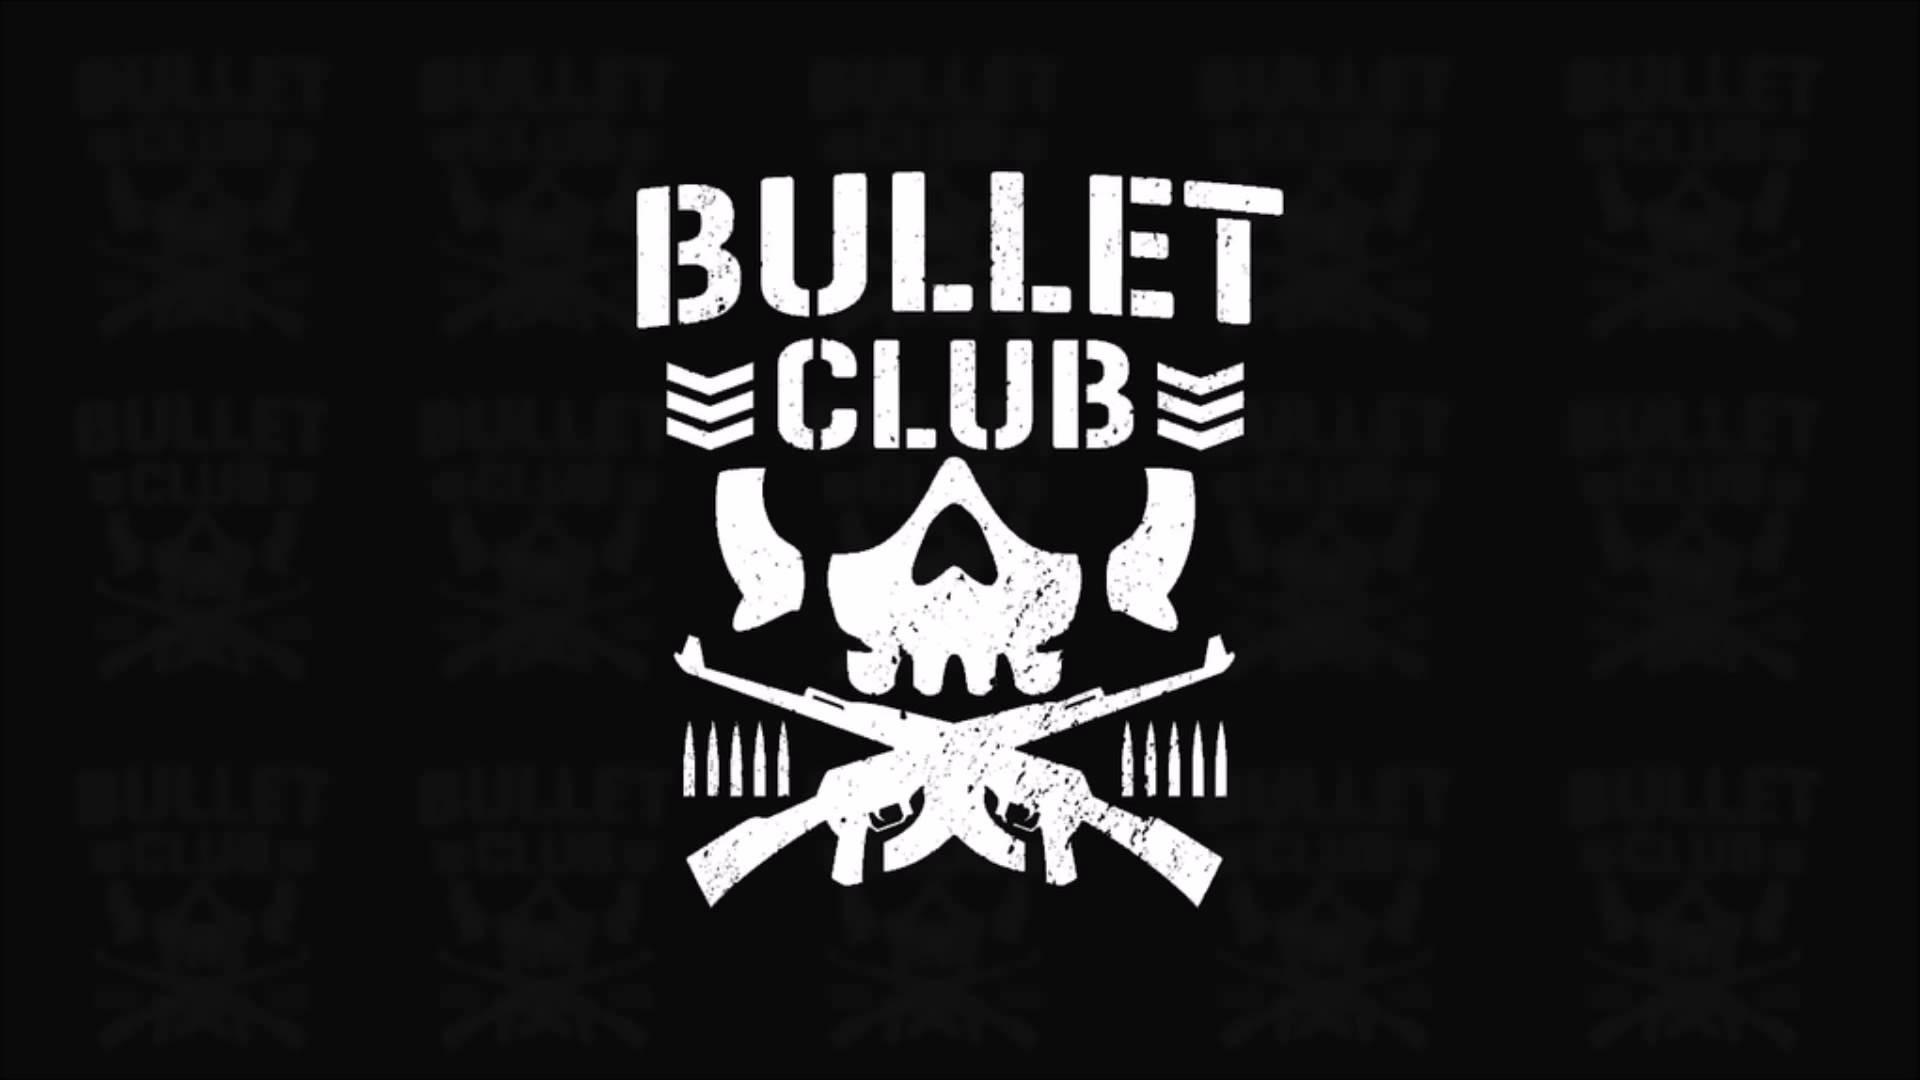 Tama Tonga Teases New Bullet Club Member – PWP Nation